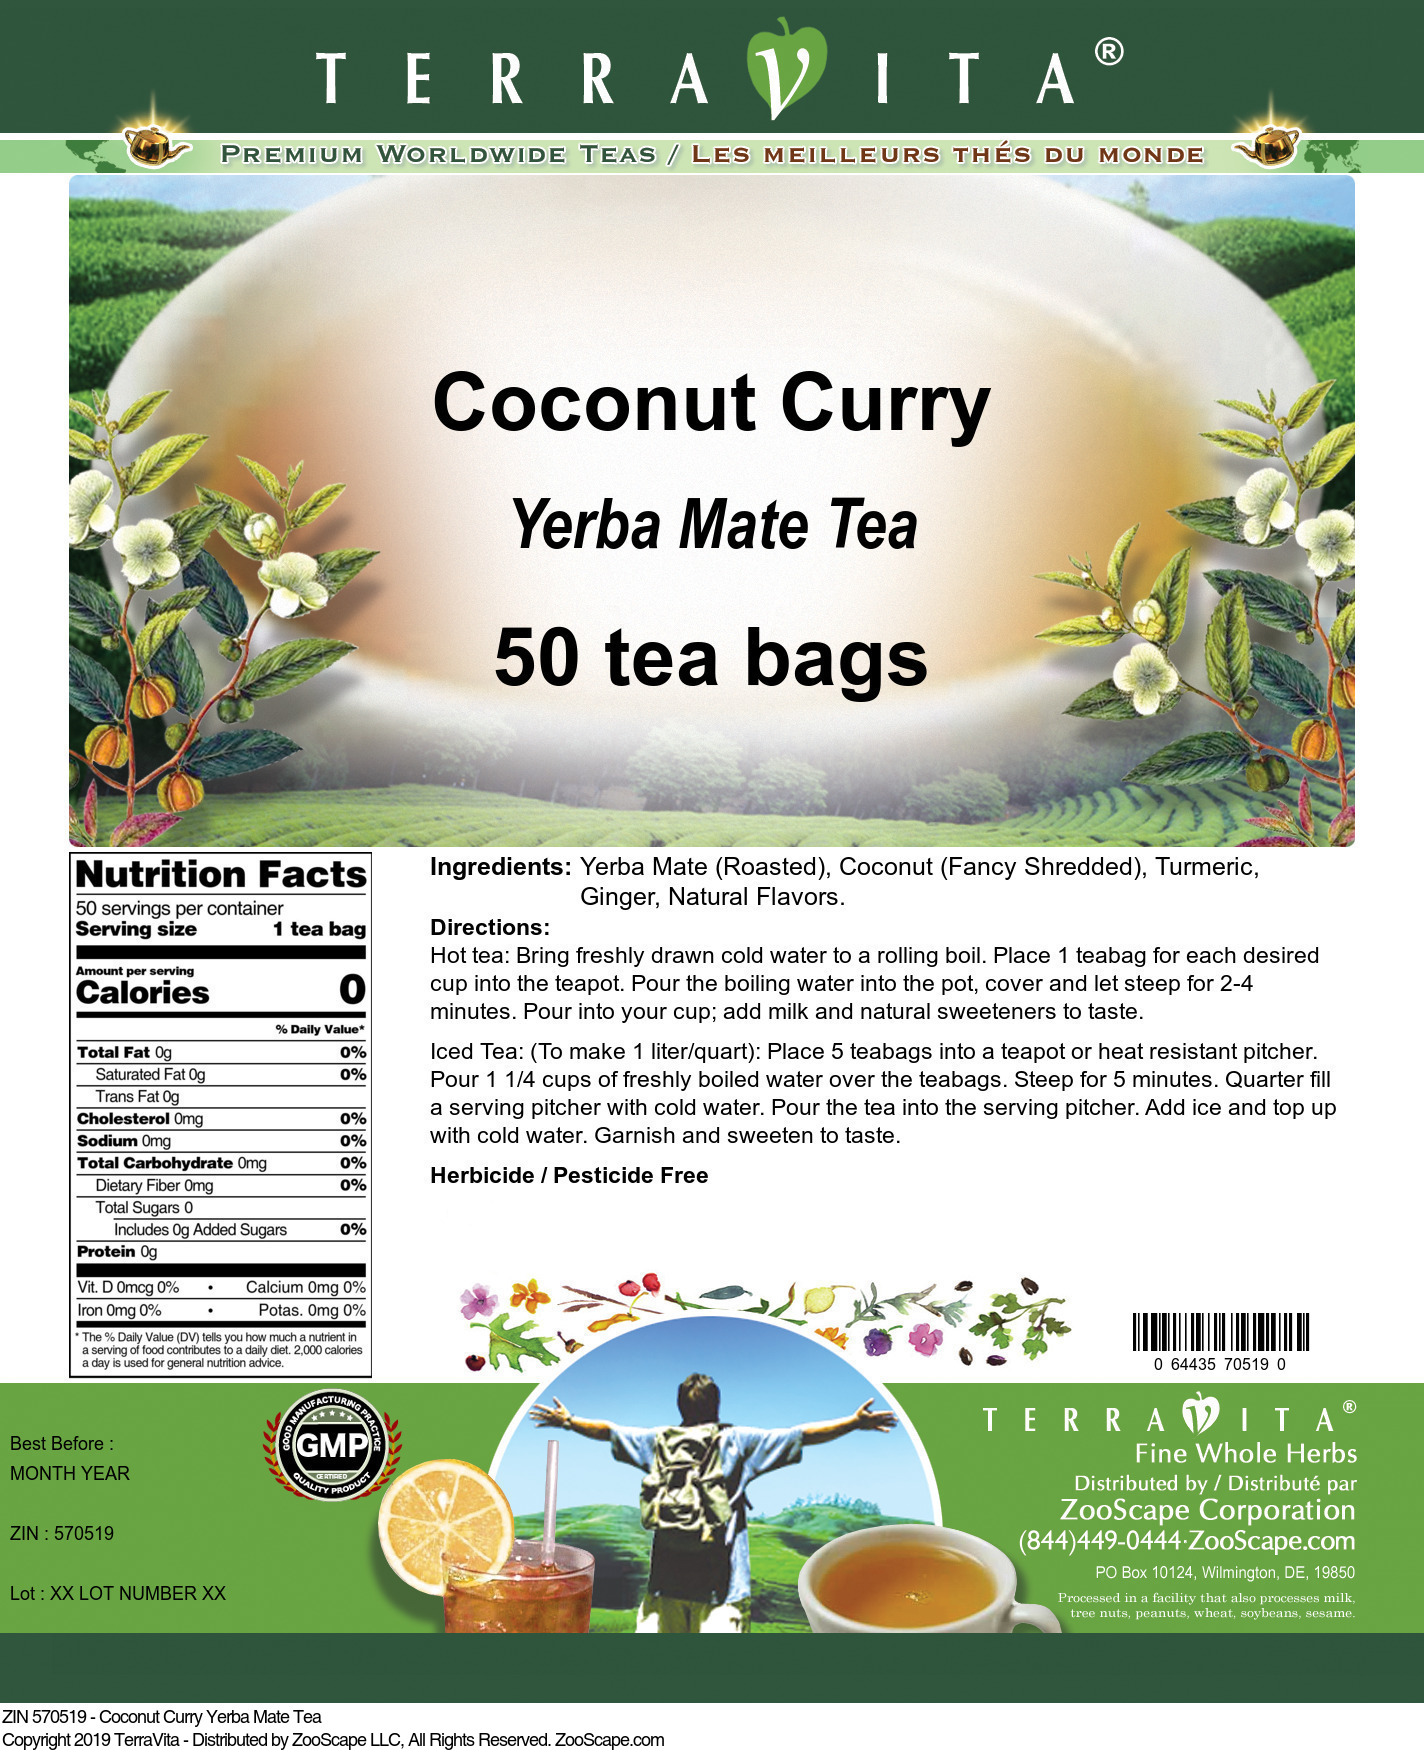 Coconut Curry Yerba Mate